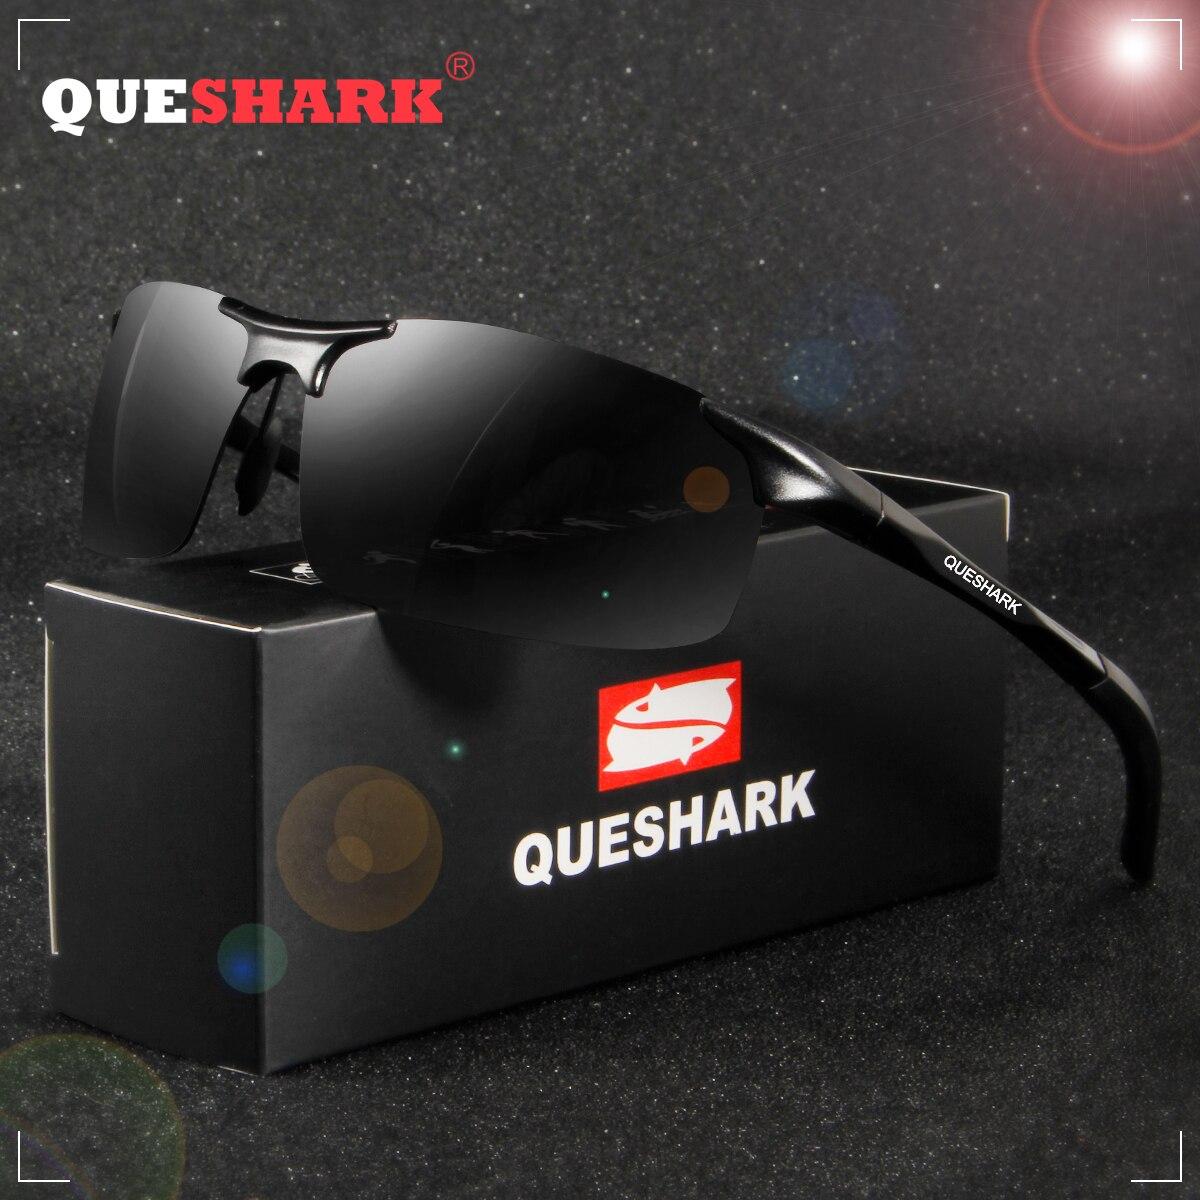 QUESHARK Men's HOT Fishing Polarized Sunglasses For Men Al-Mg Metal Frame Ultra Light Driving Hiking Golf Sports